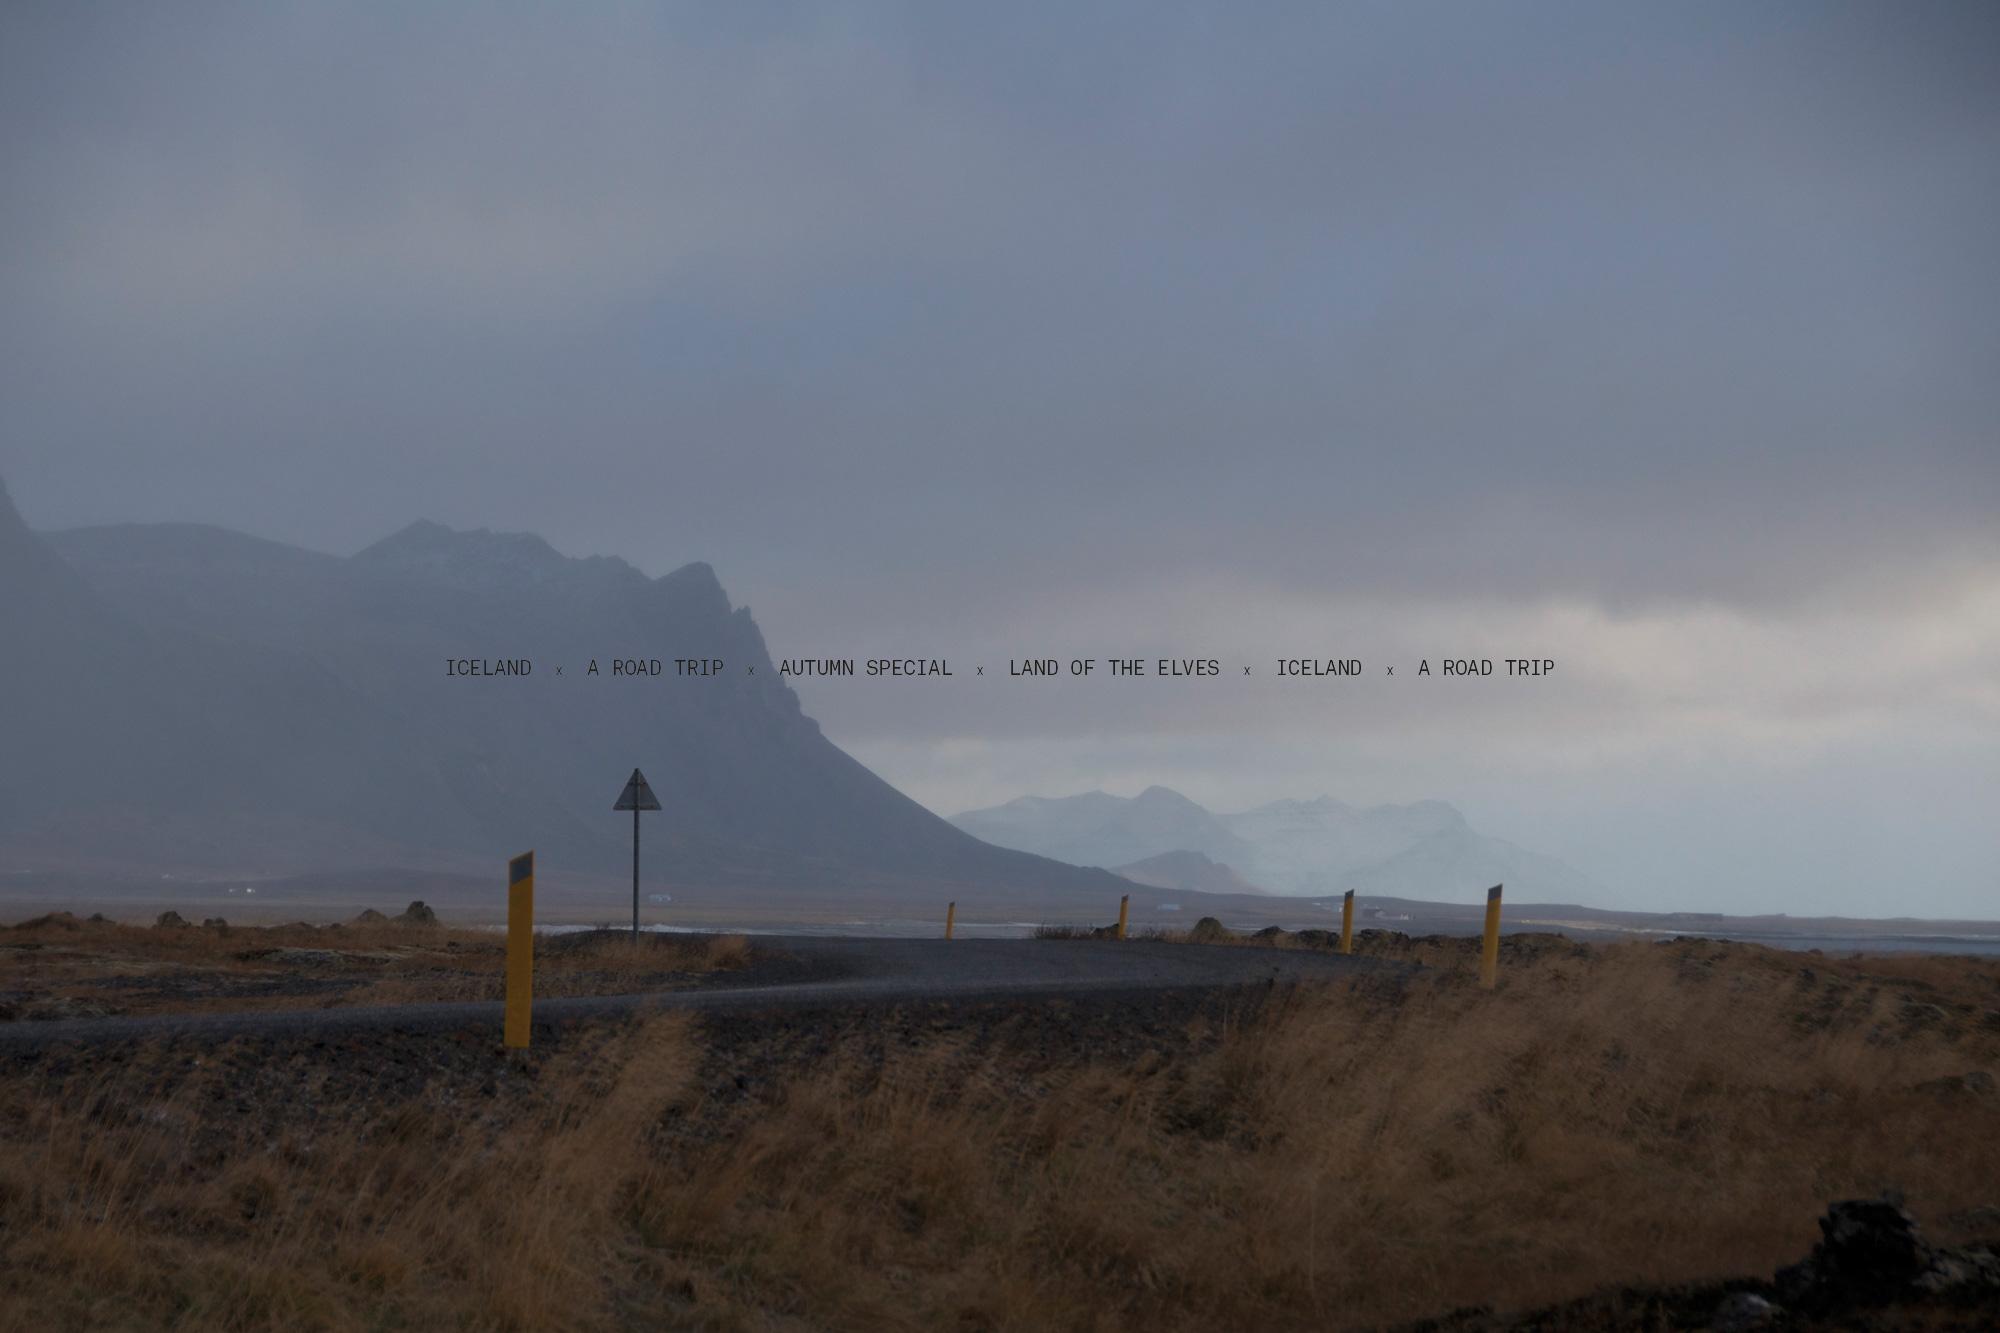 planx-iceland-fotoreportage02m